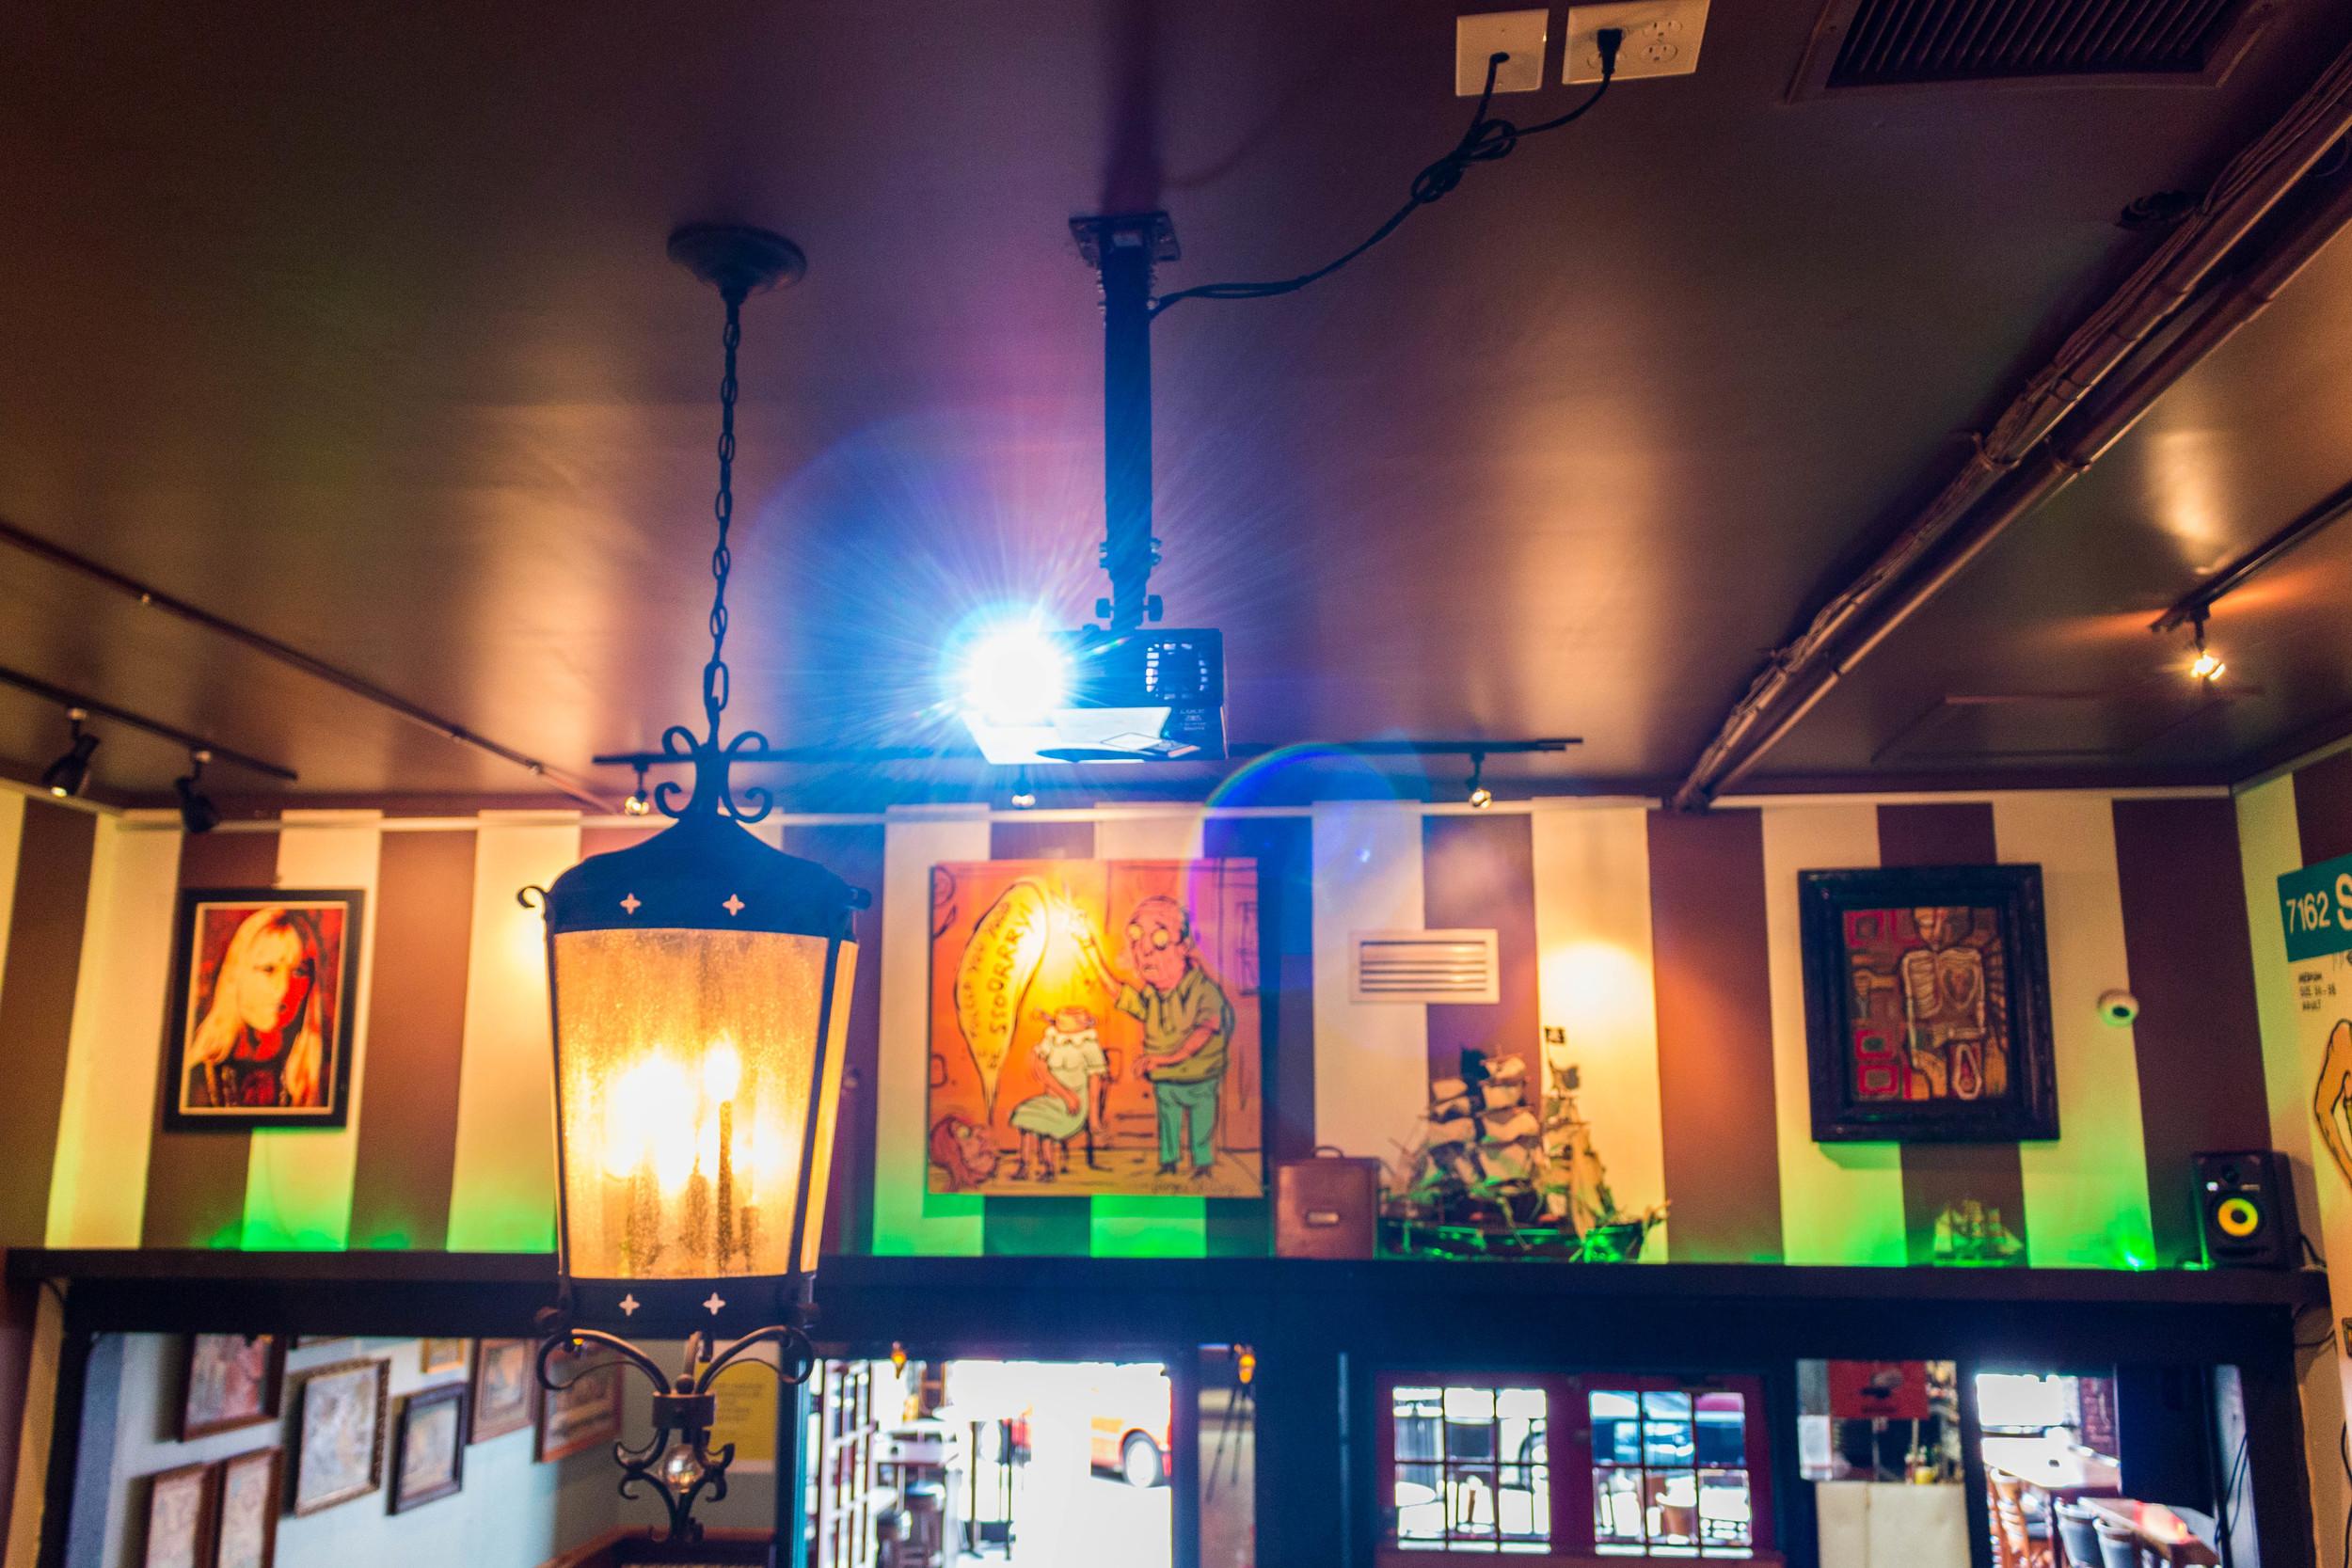 birdies ceiling and projector.jpg